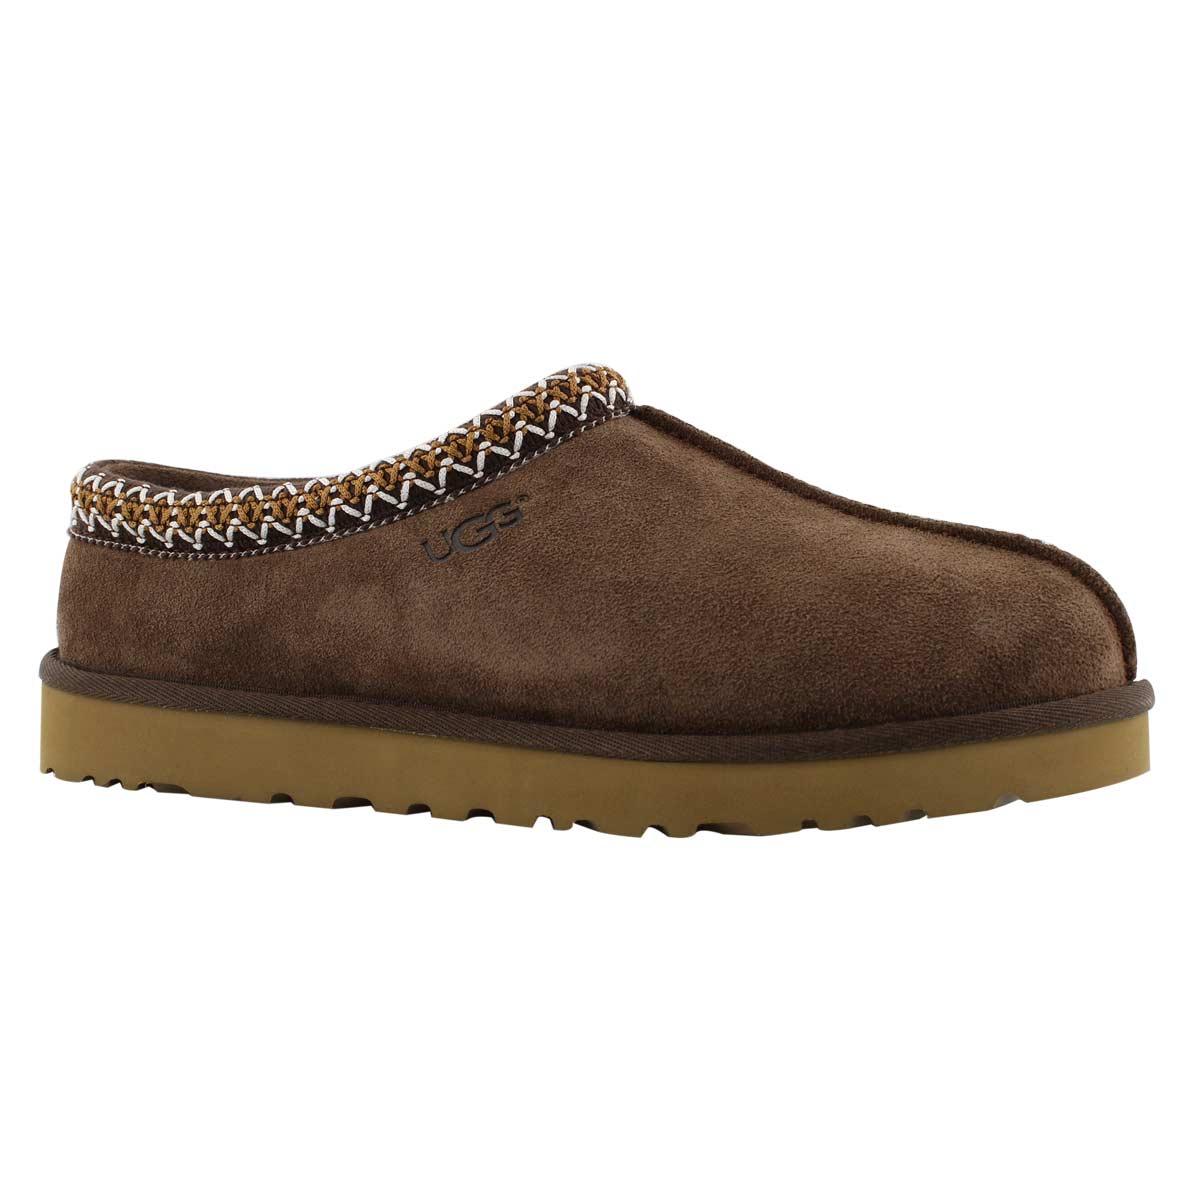 Mns Tasman chocolate sheepskin slipper